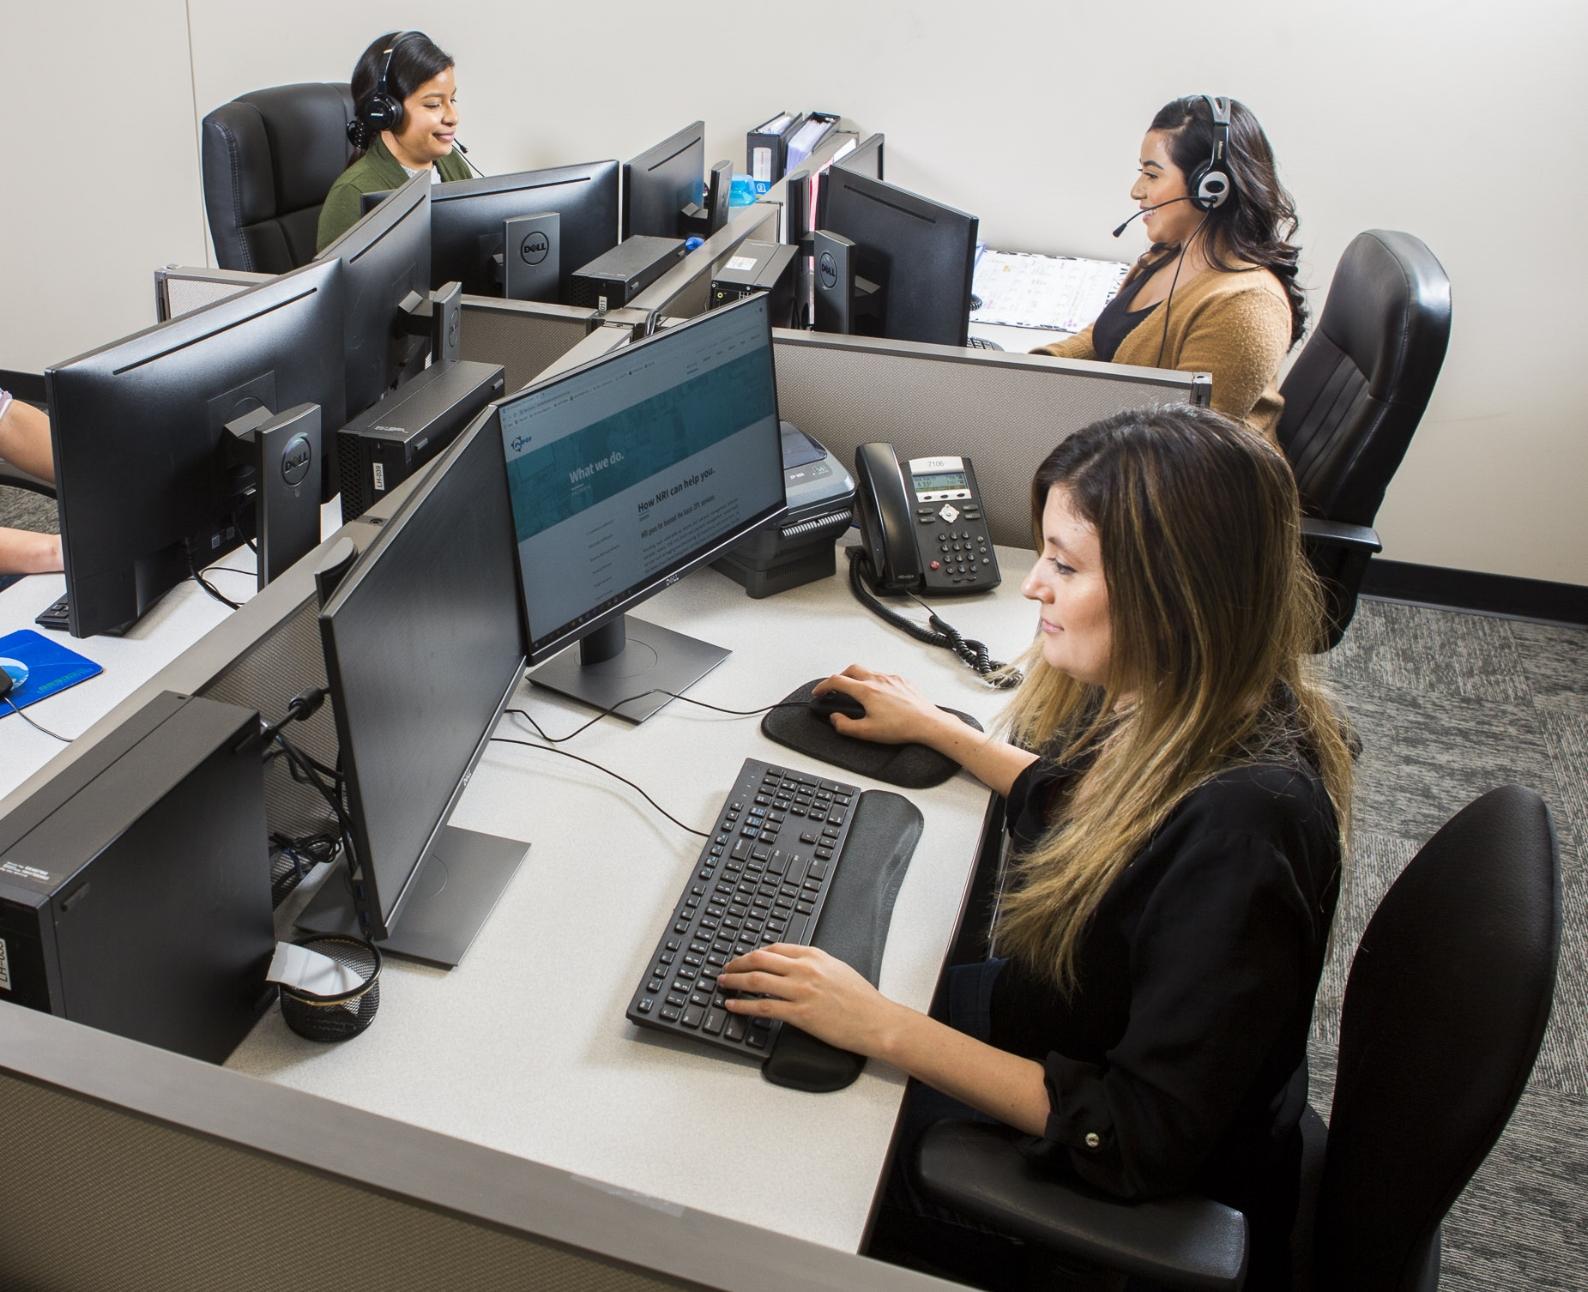 Three women wearing headsets working at desks